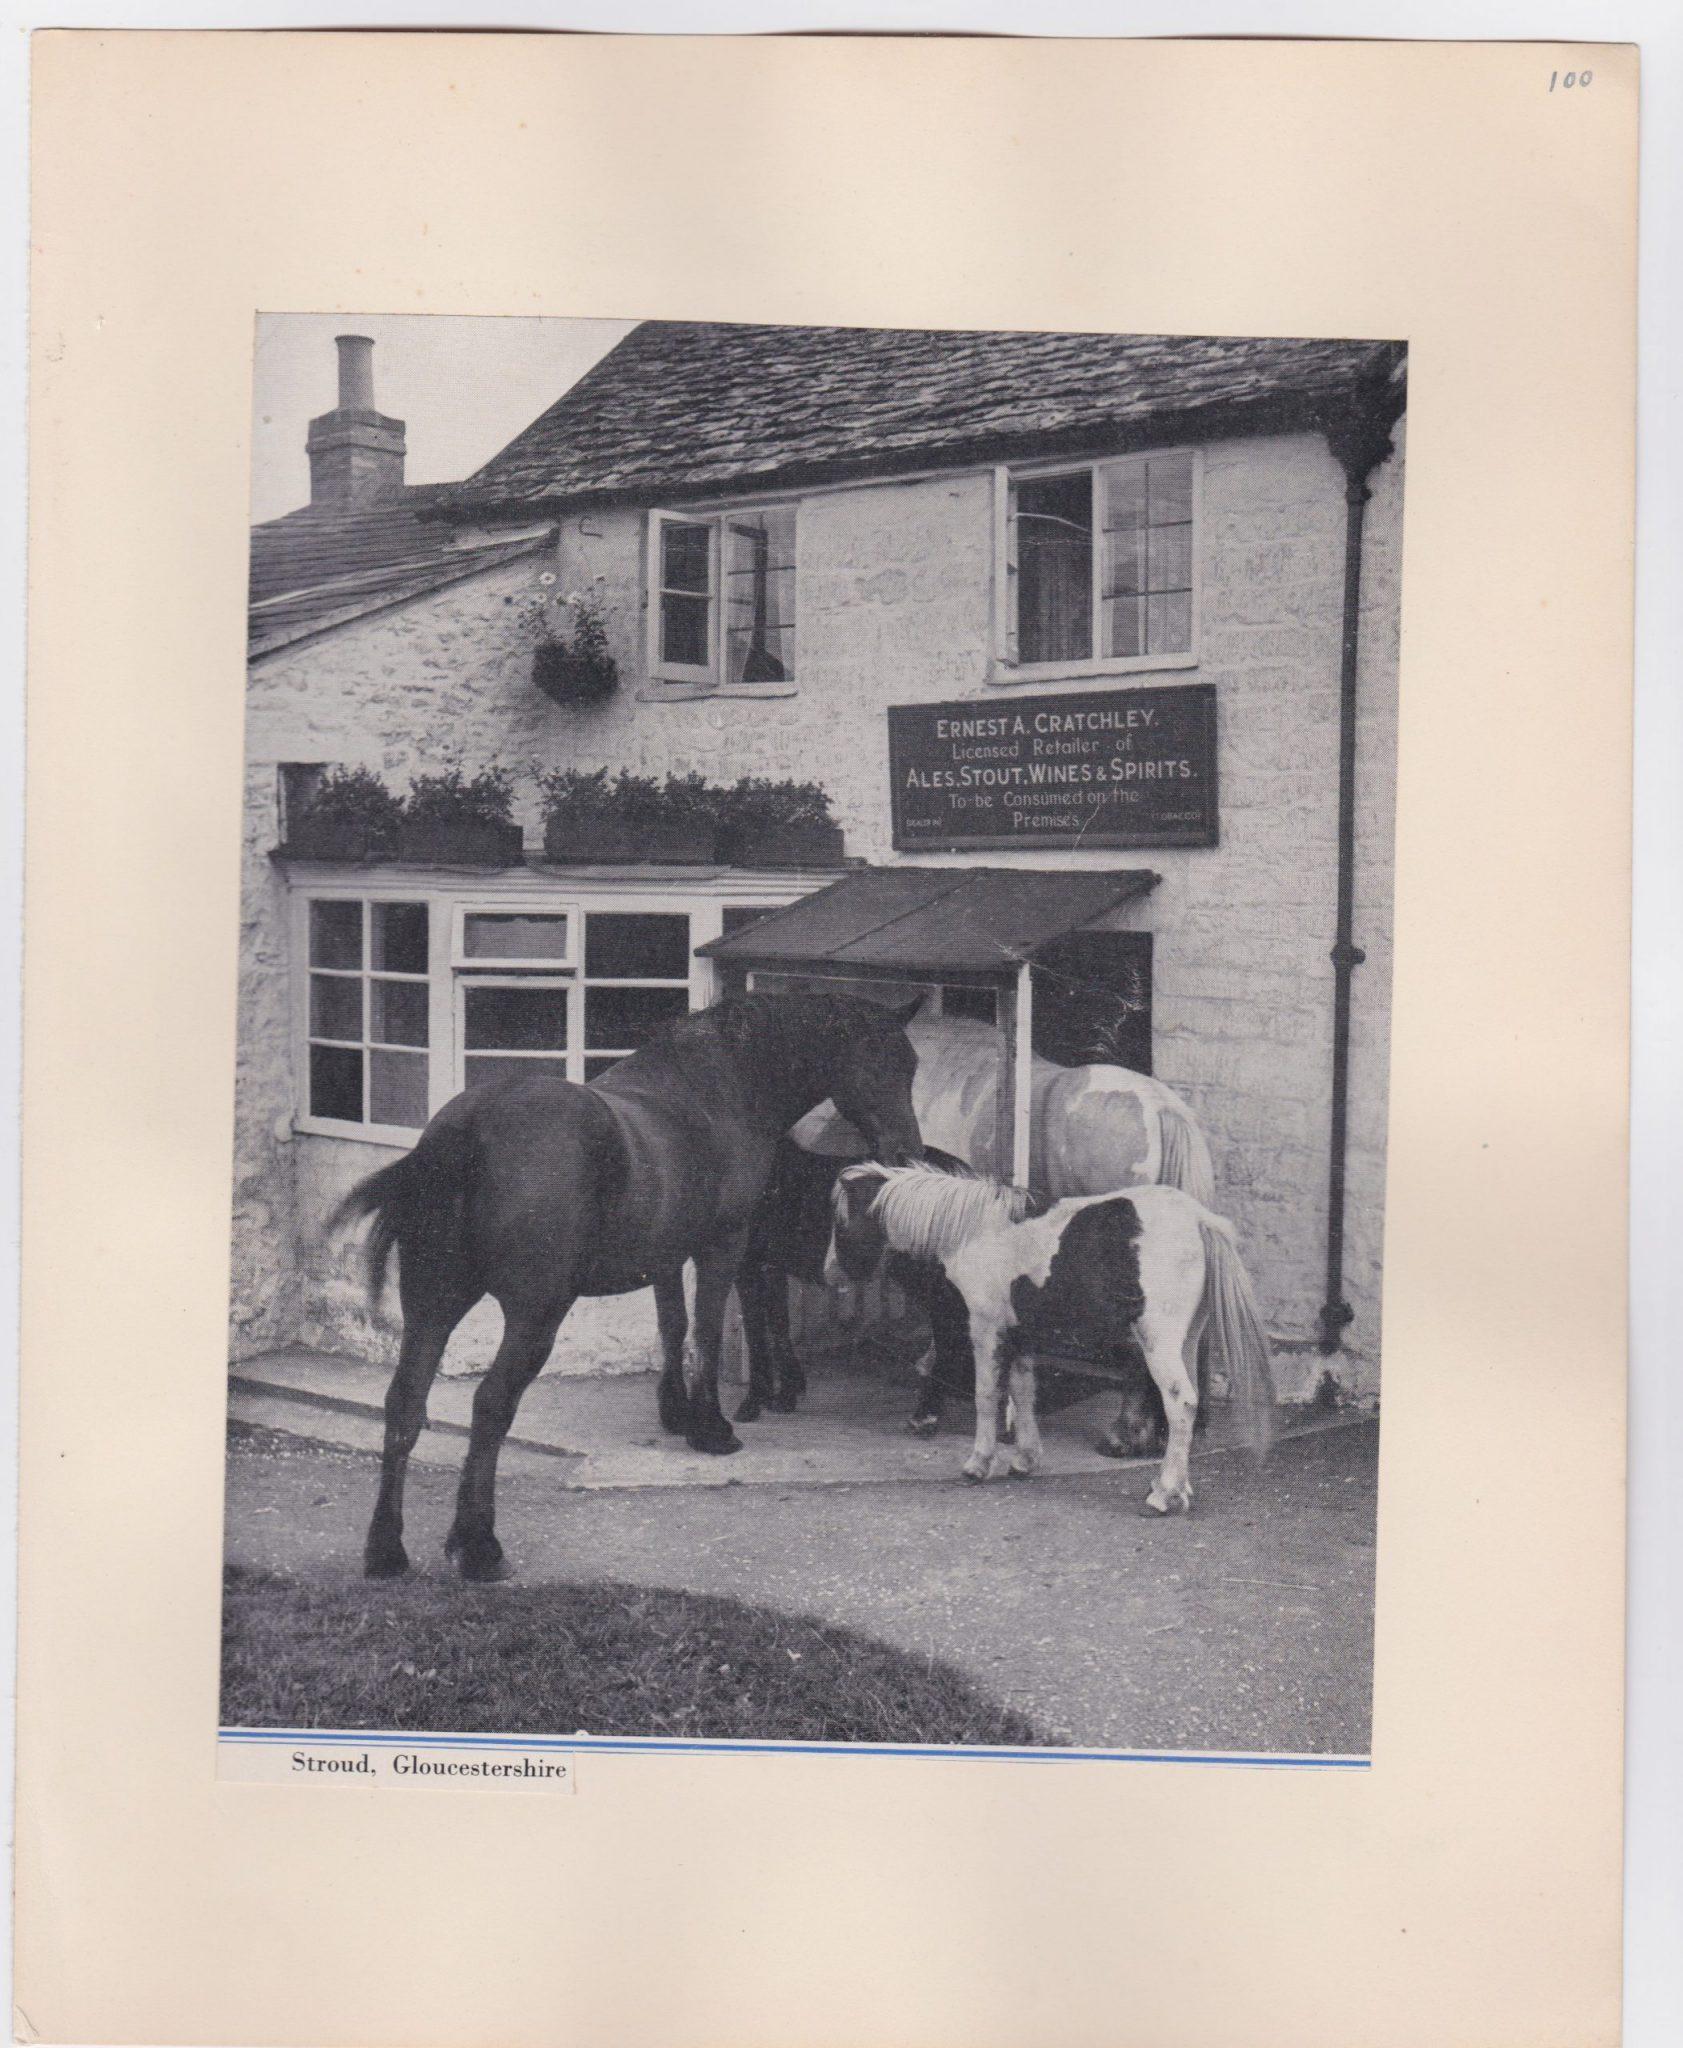 A Pub History Scrapbook Archive 43